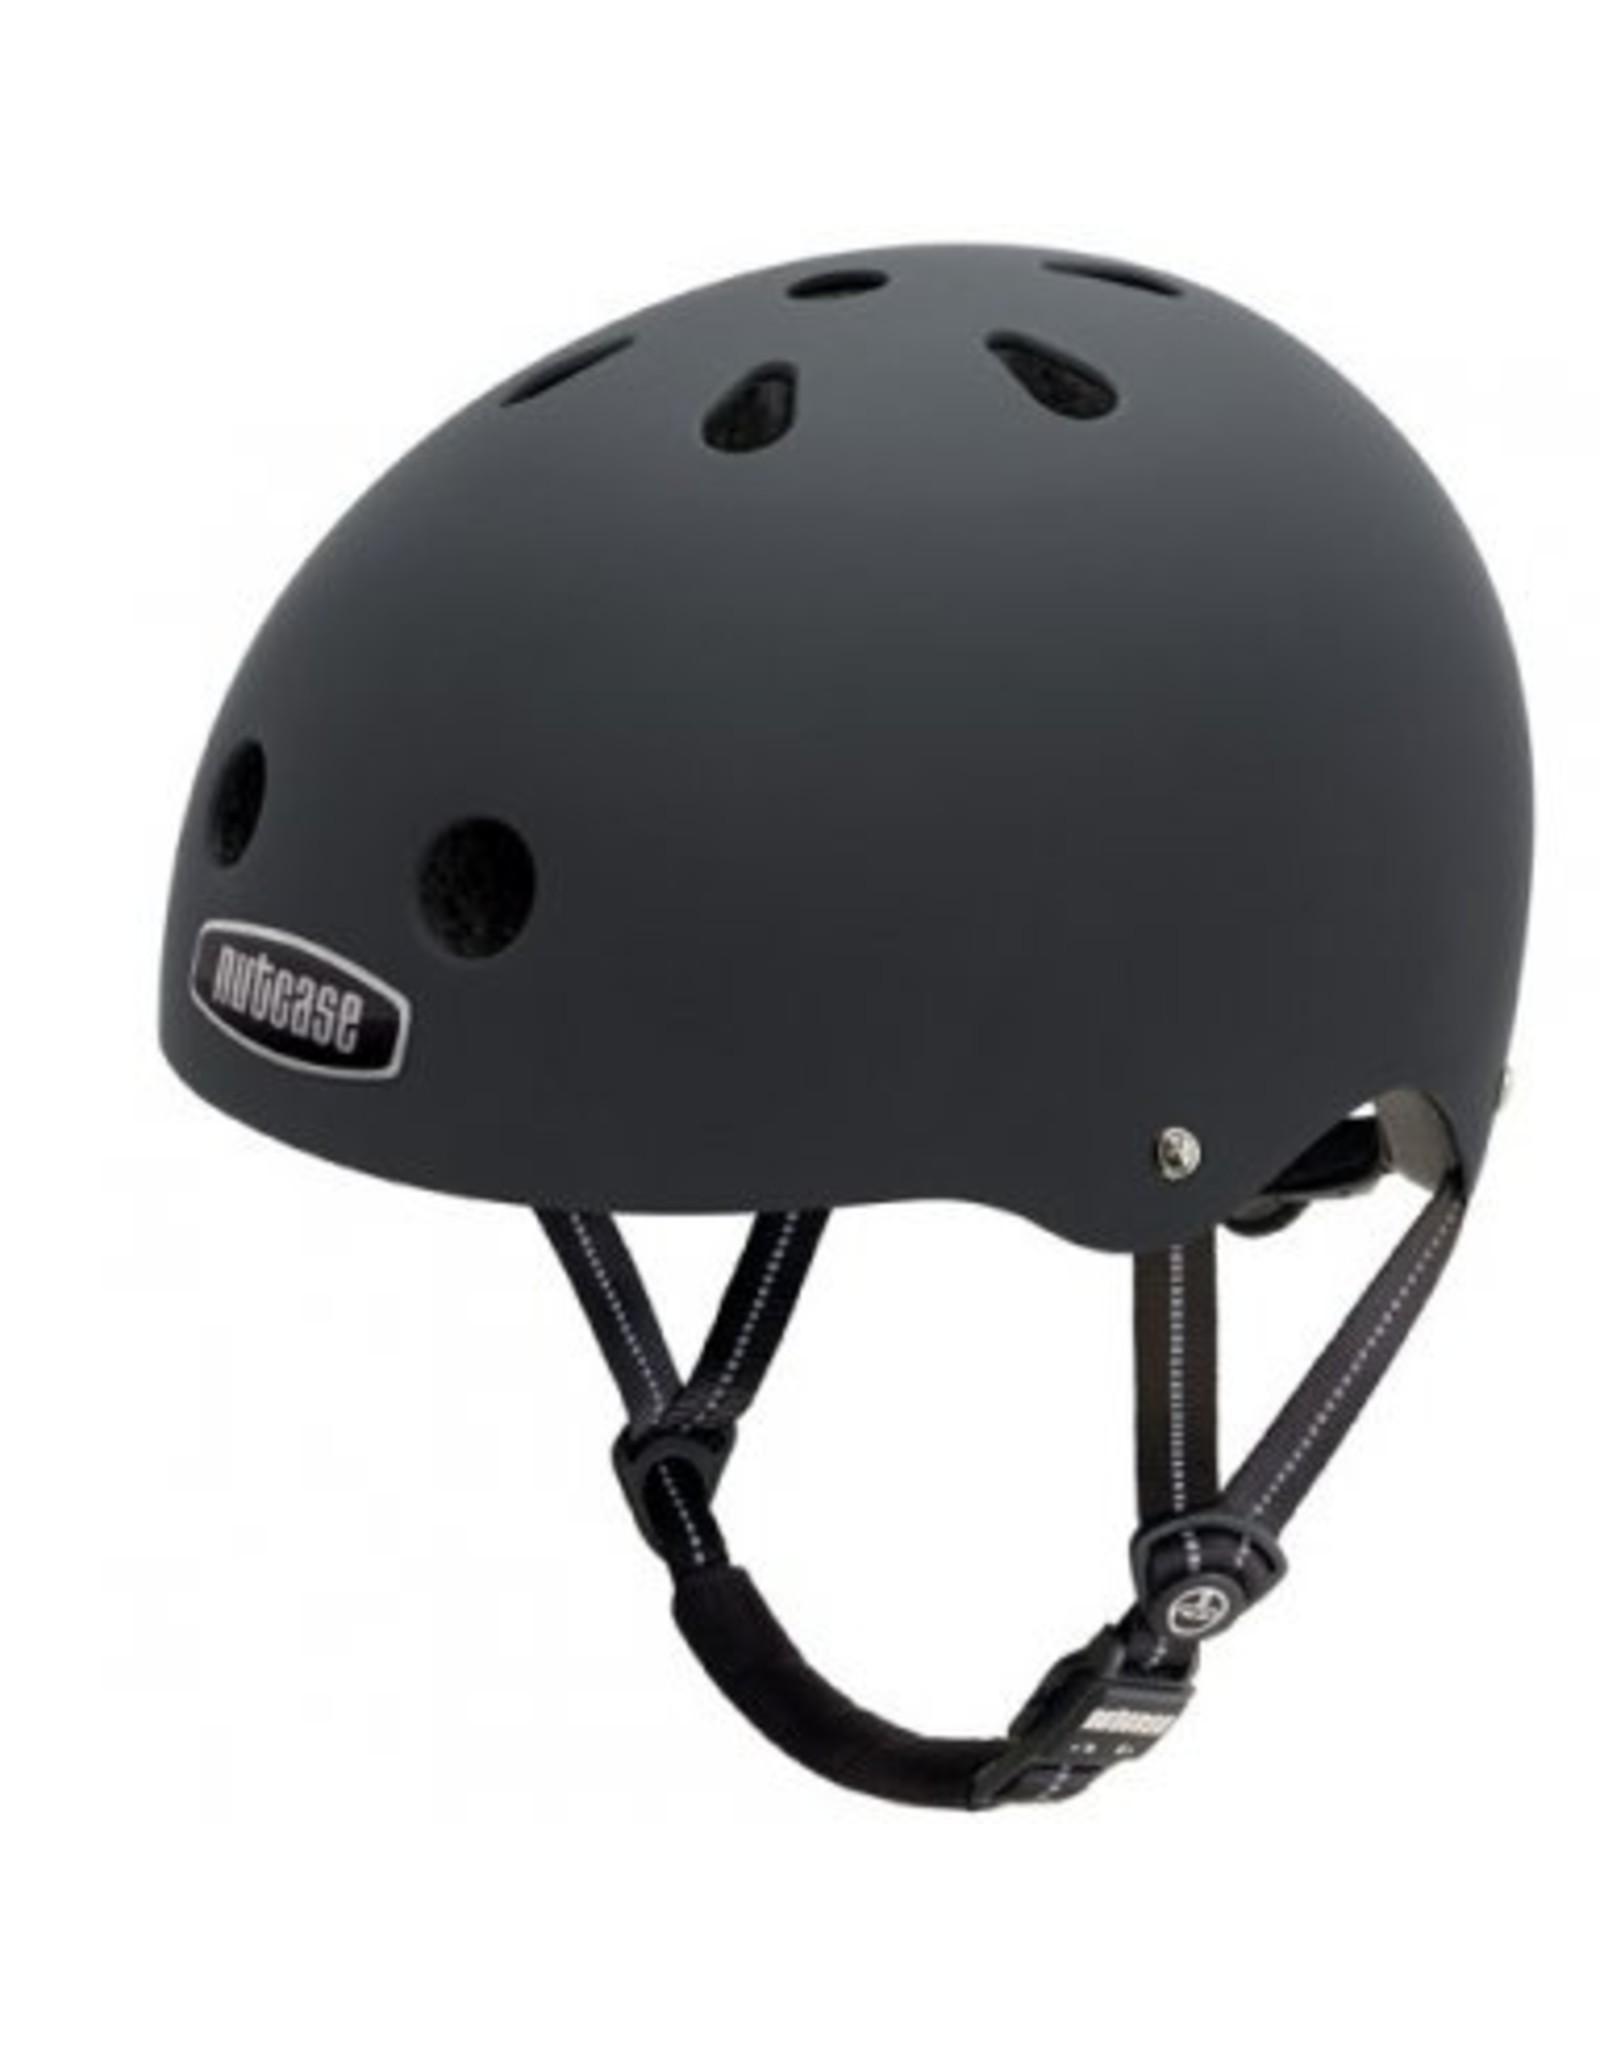 Nutcase fietshelm kind Gen3 Blackish